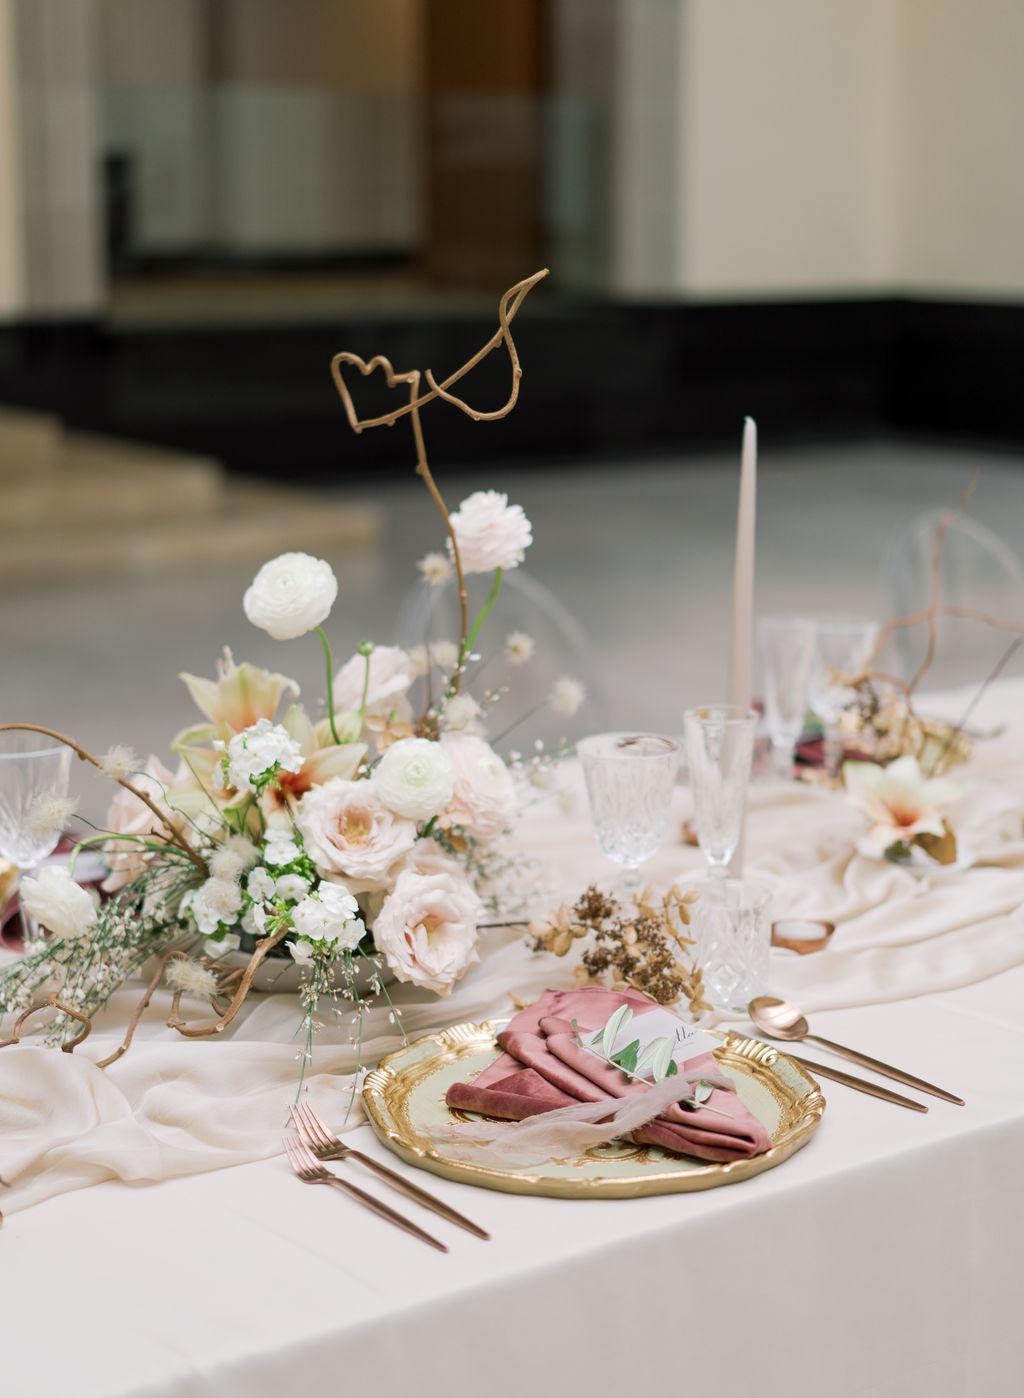 artiese-ago-wedding-editorial-06599.jpg